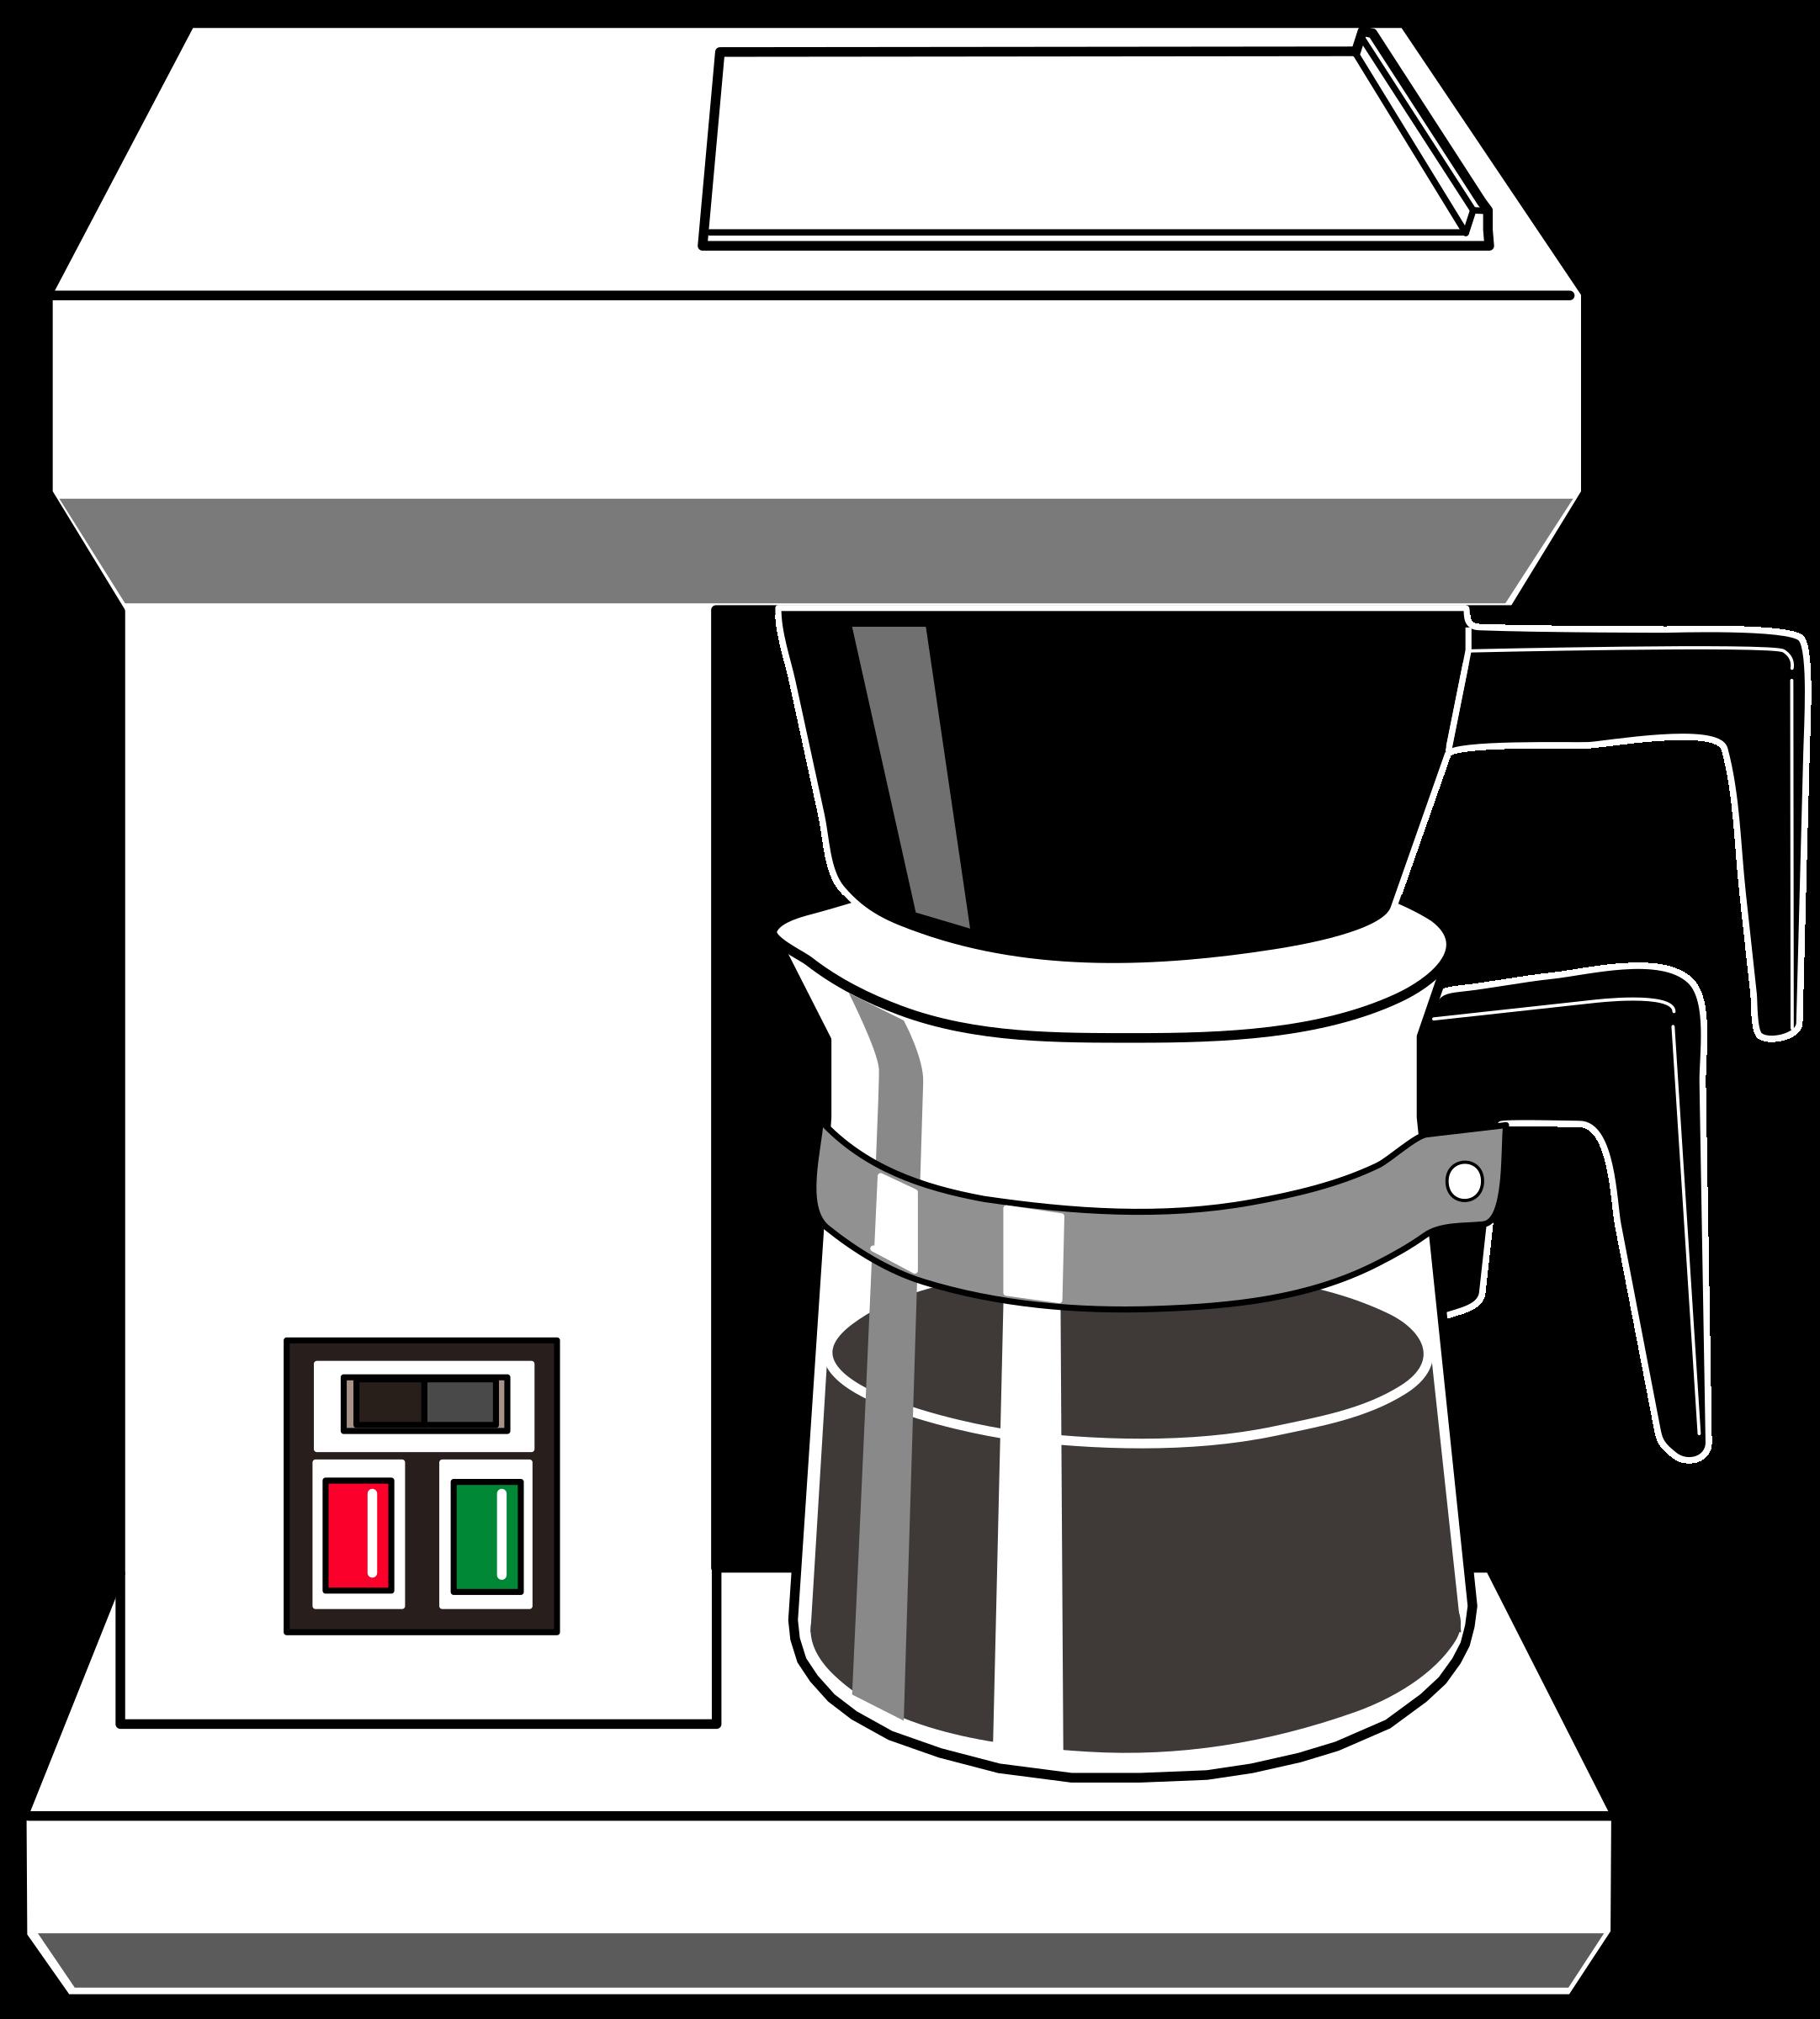 Clipart coffee line art. Drip maker big image